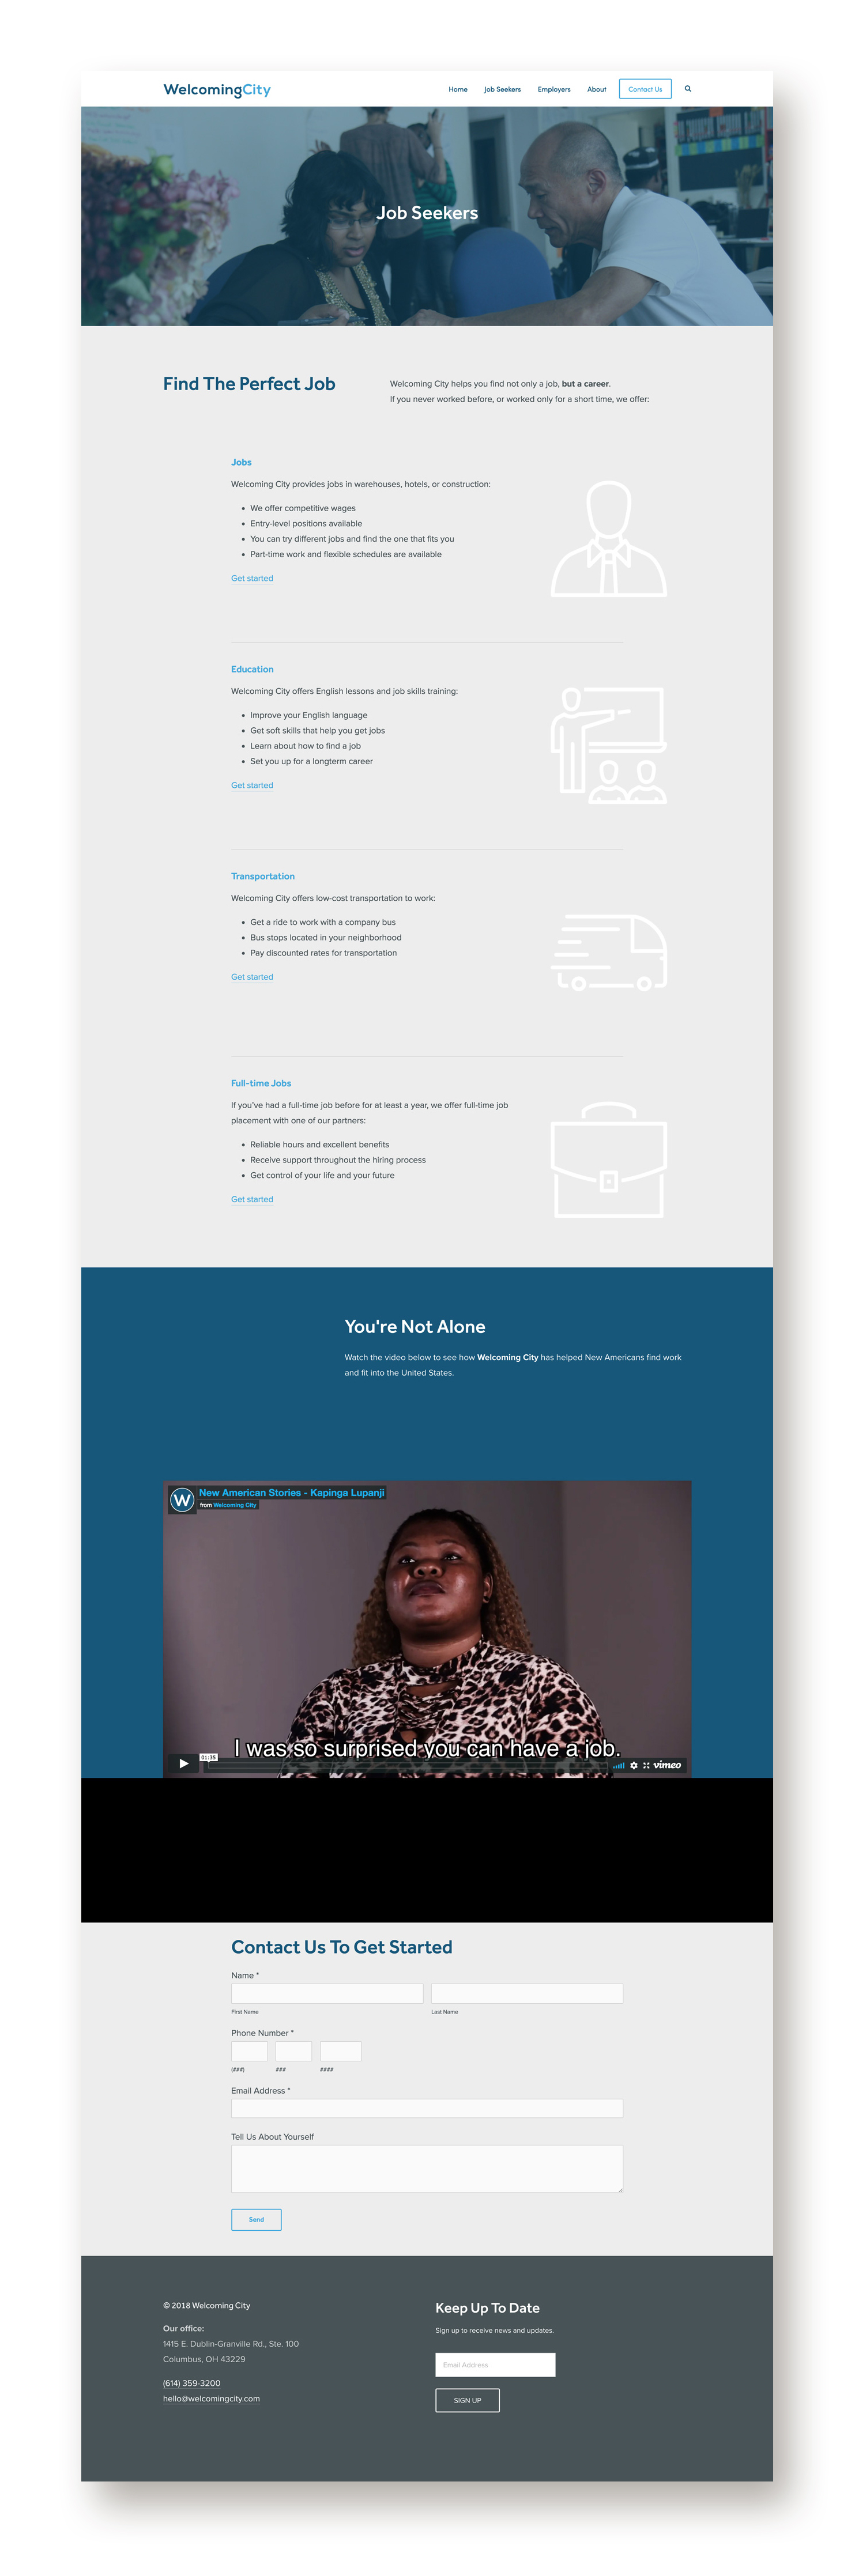 screencapture-welcomingcity-jobs-2018-08-17-09_20_08_FW2.jpg